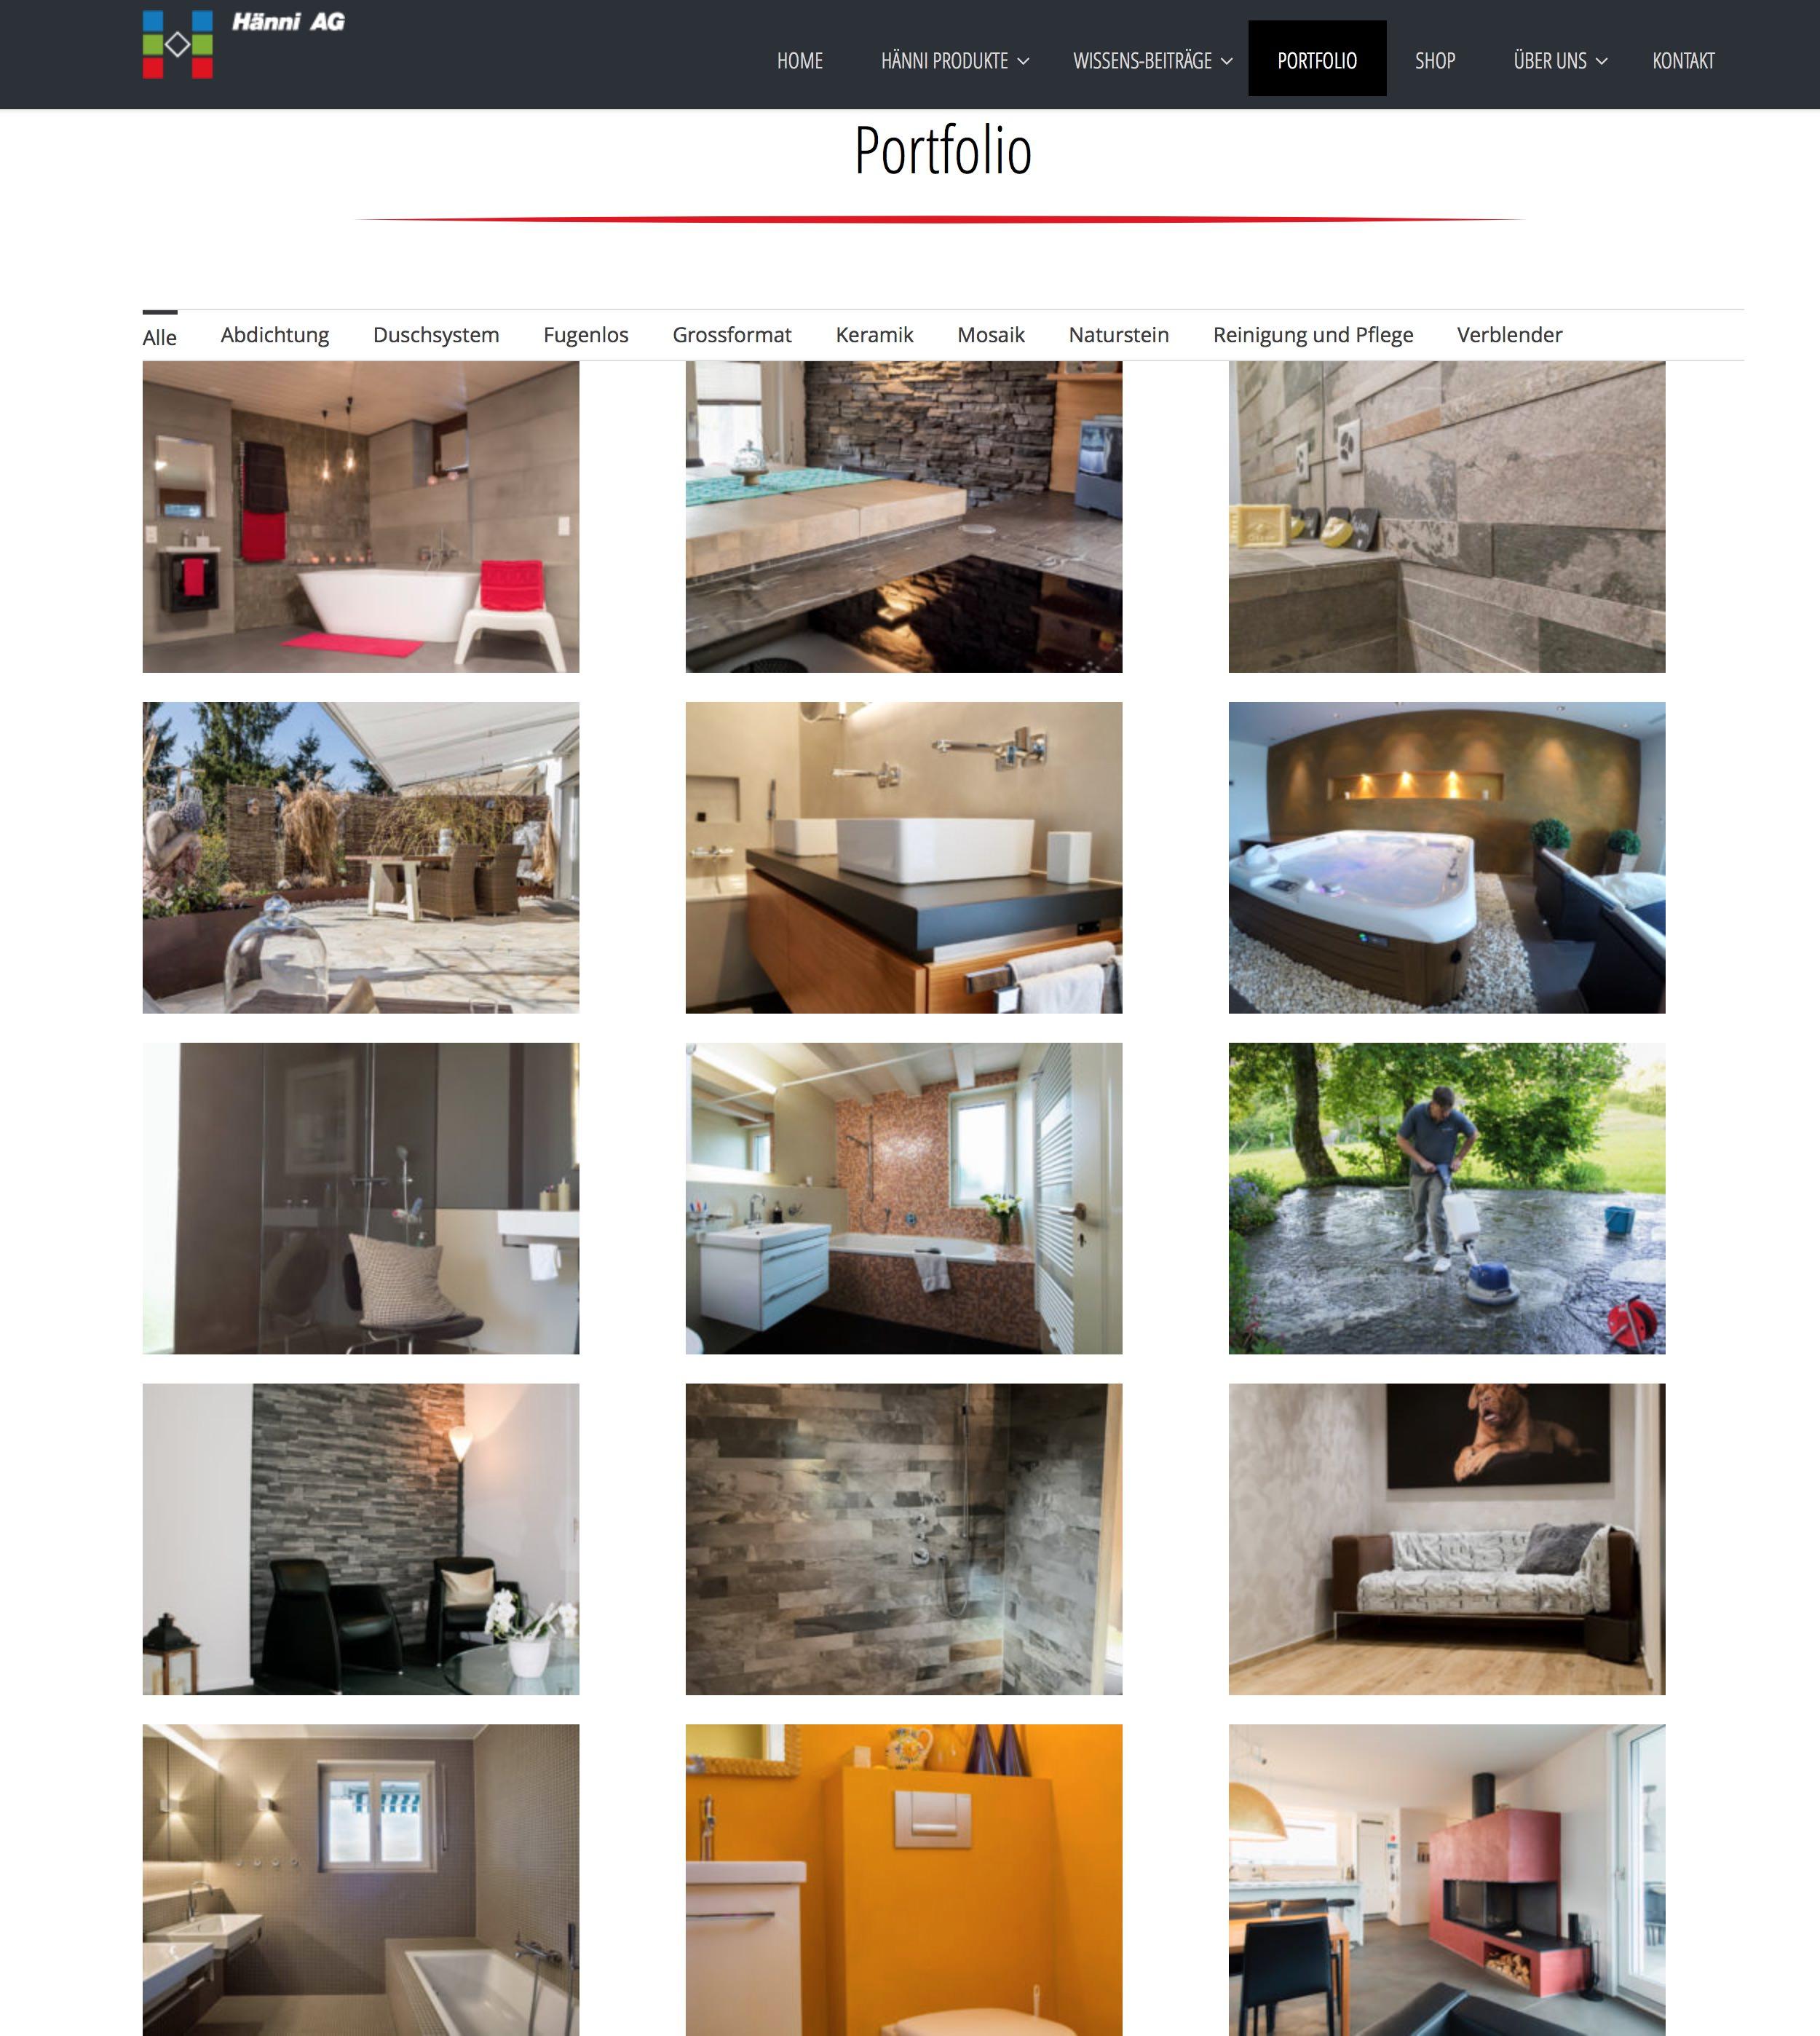 portfolio-haenni ag-partners in gmbh-2.jpg